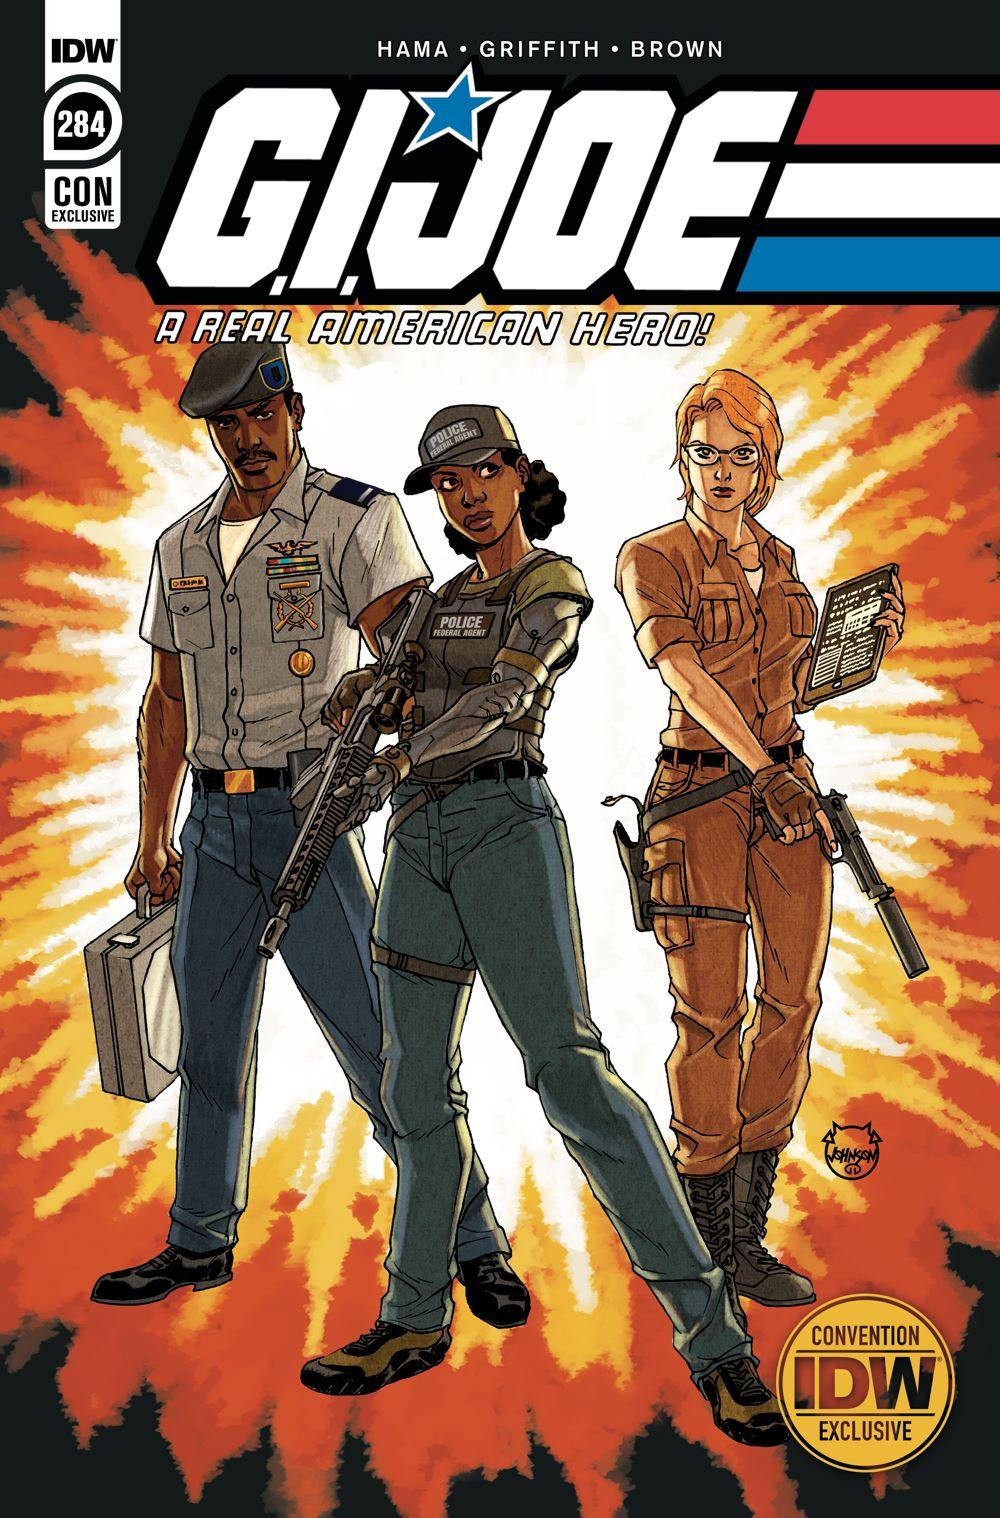 GIJoeRAH284-coverCON_A ComicList Previews: G.I. JOE A REAL AMERICAN HERO #284